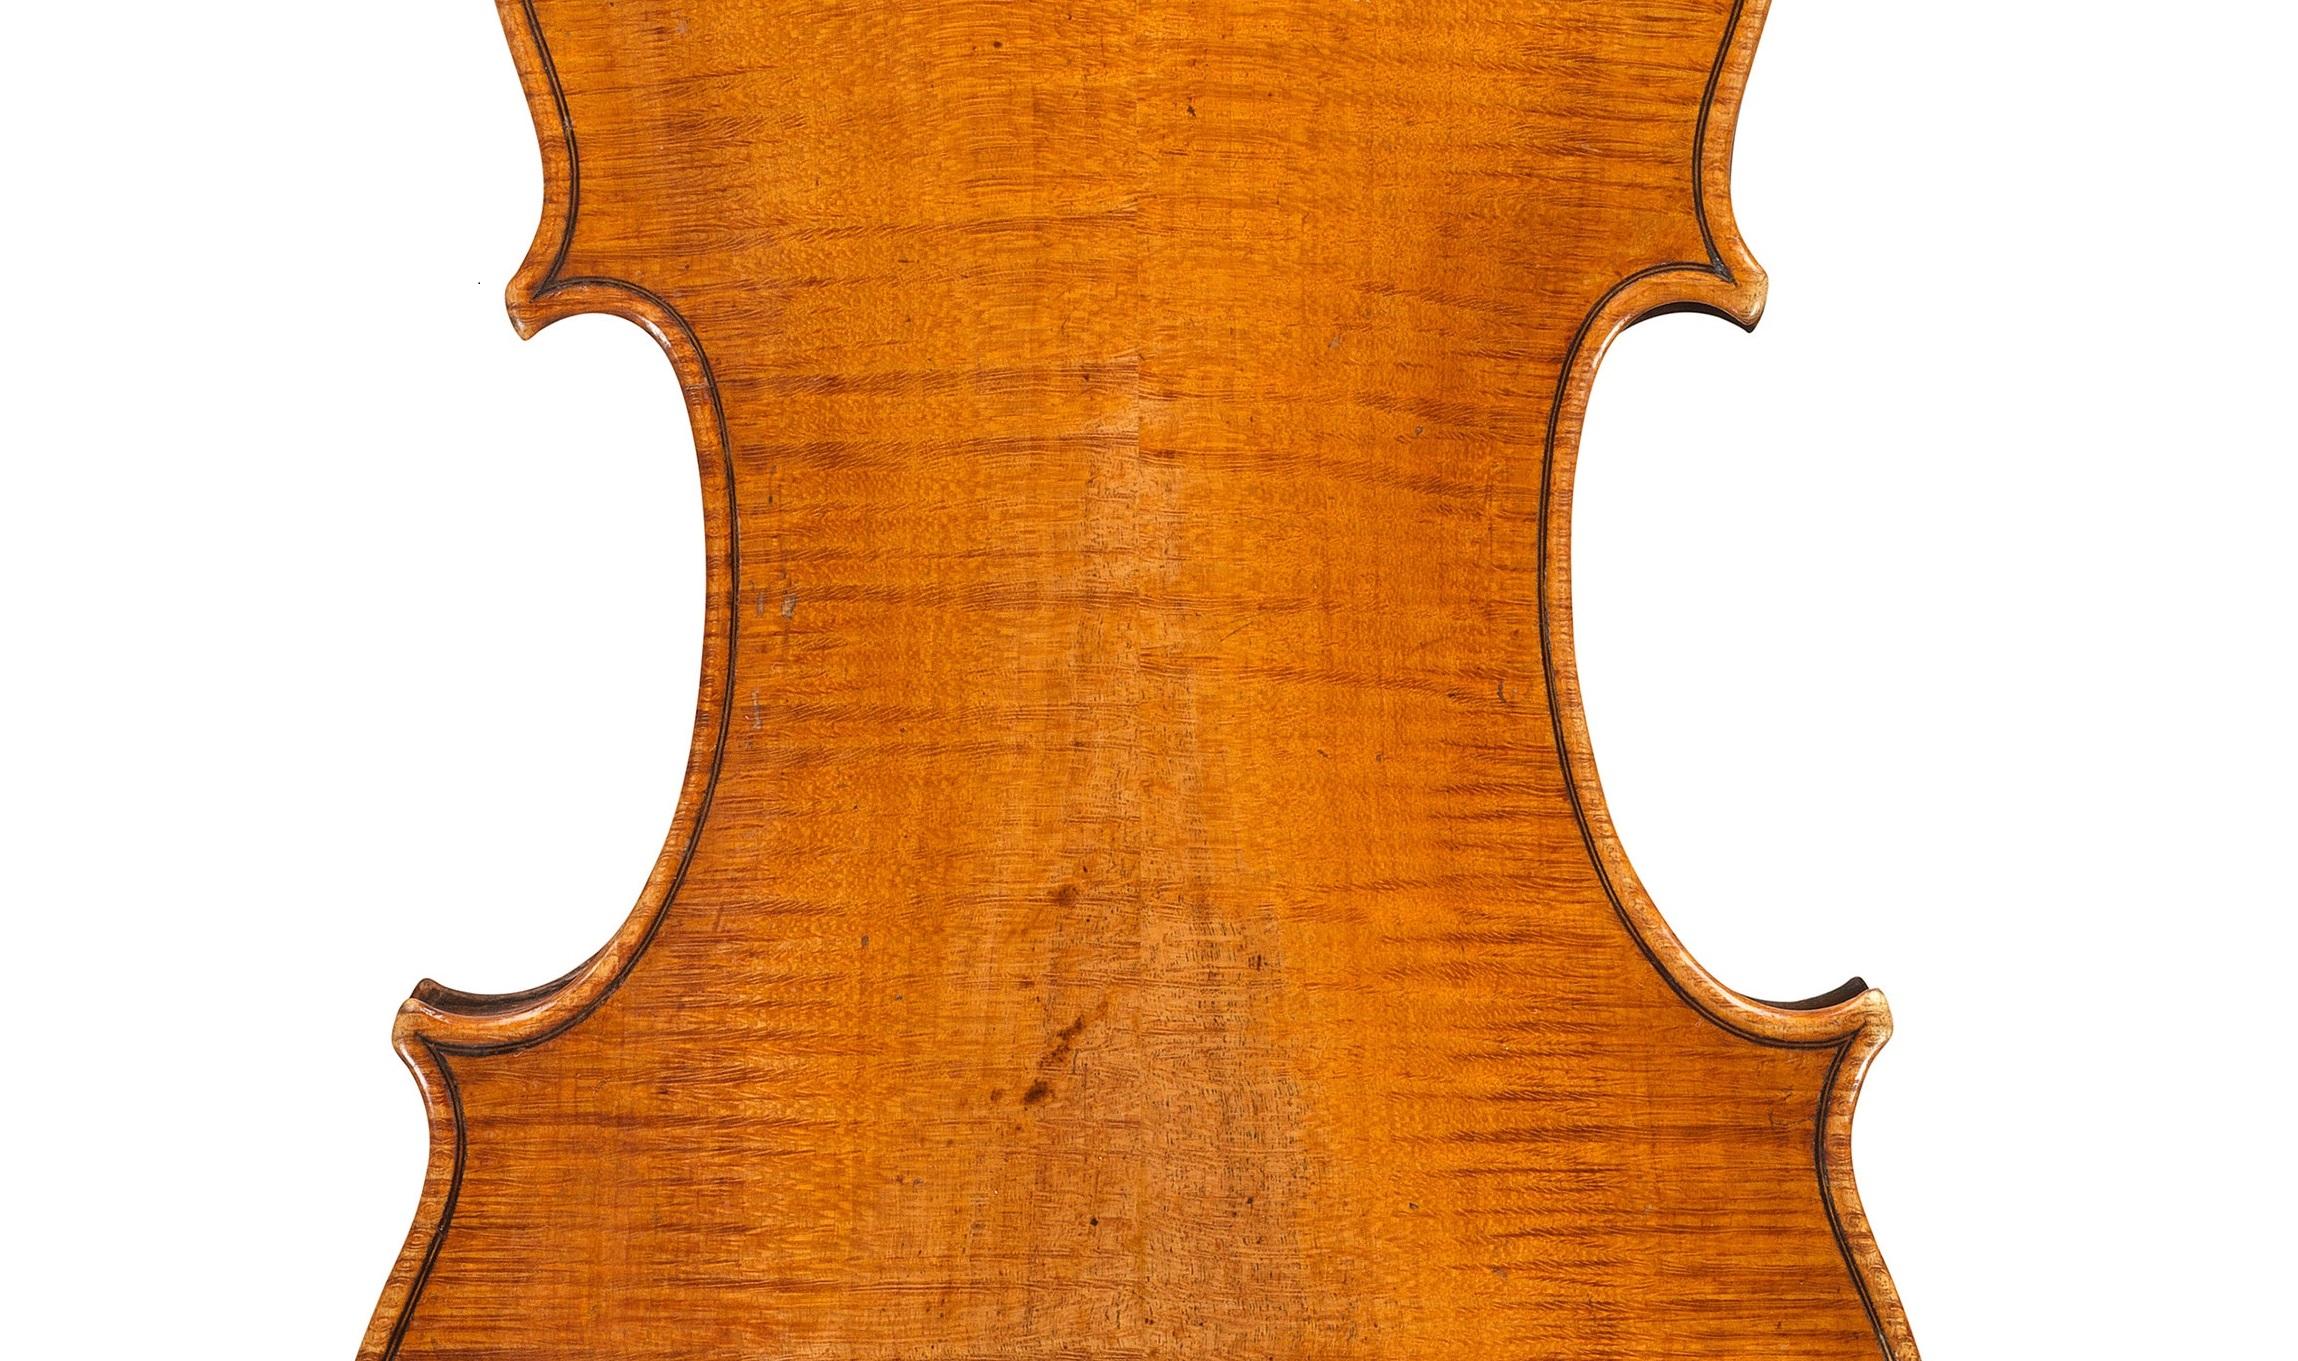 Back of a violin by Antonio Stradivari, ex-Sachs, 1667